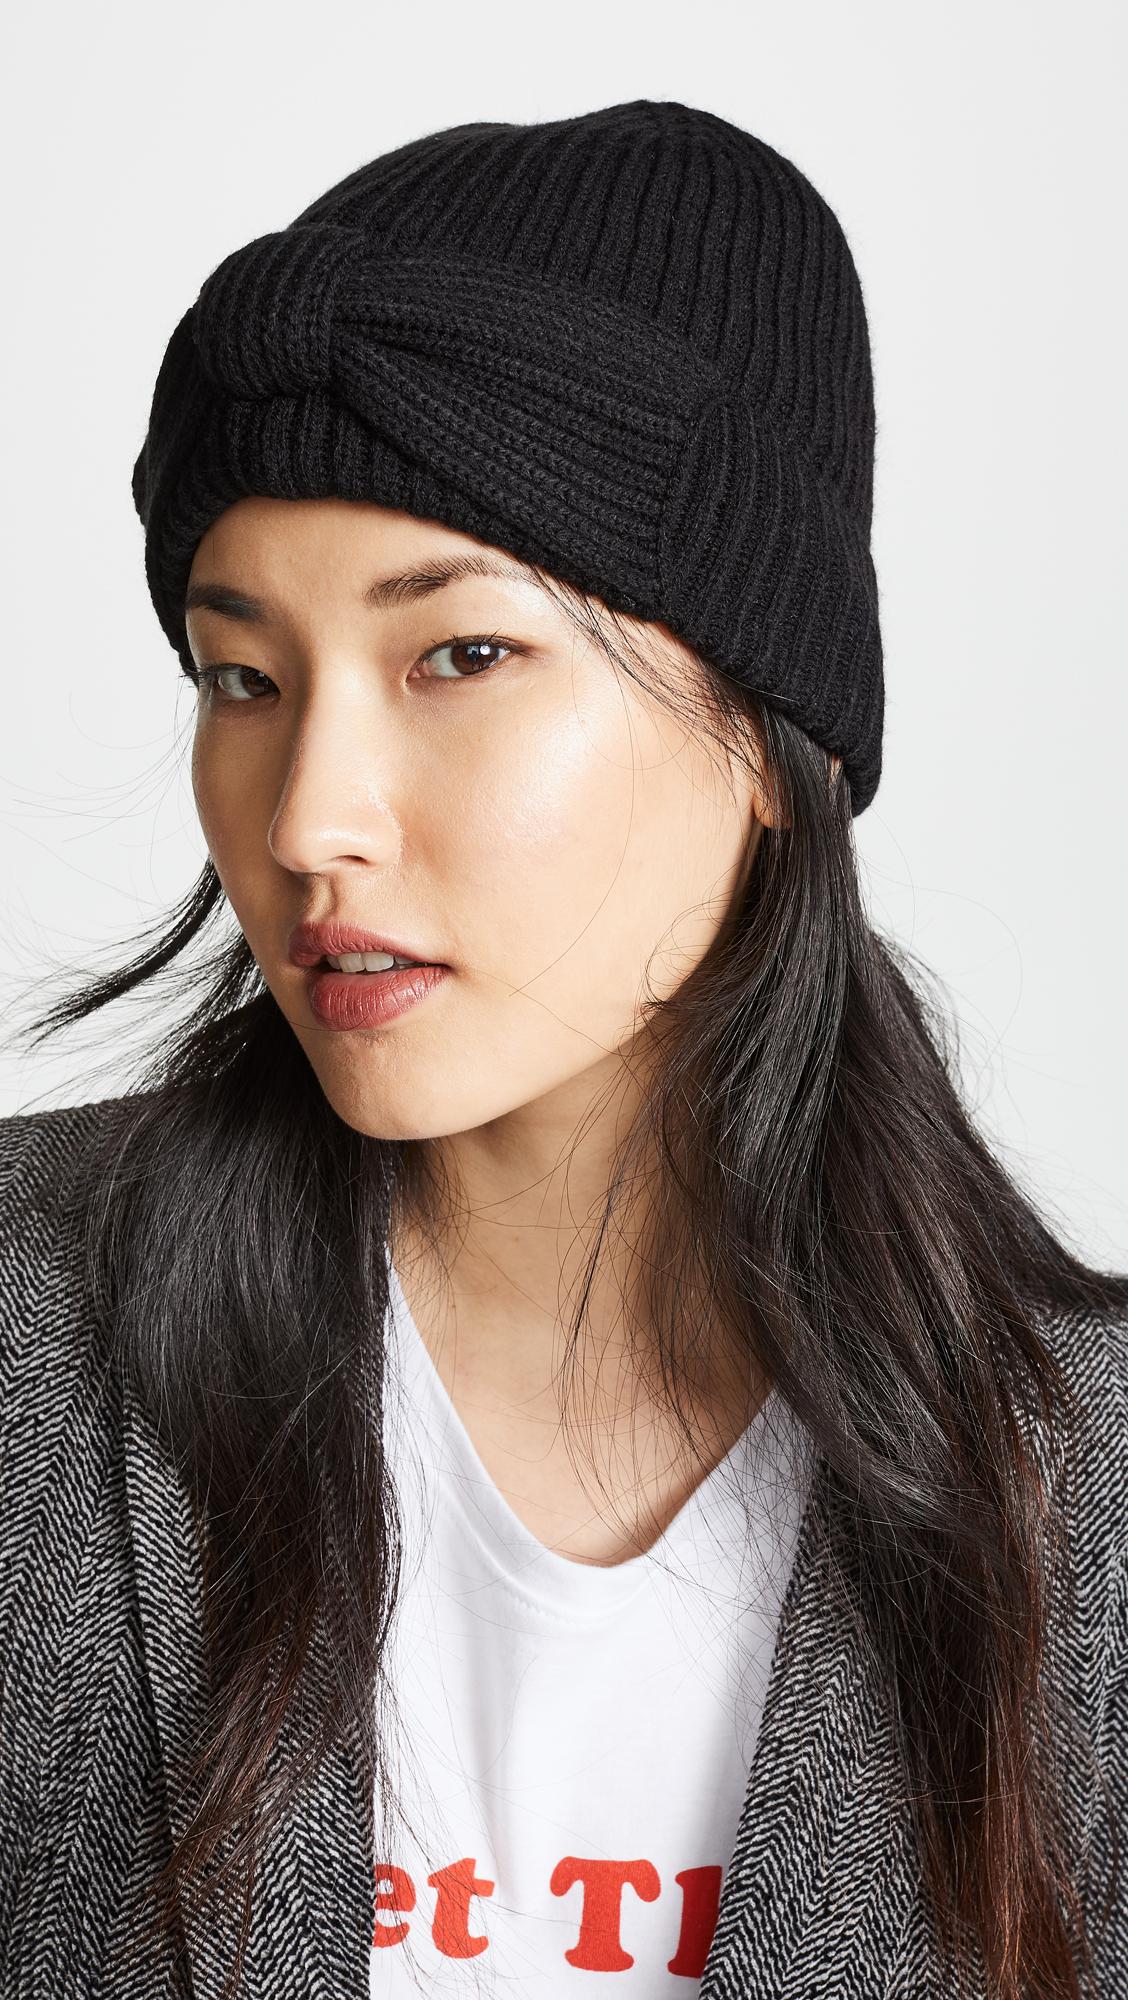 4a6a004cda6 Kate Spade New York Solid Bow Beanie Hat